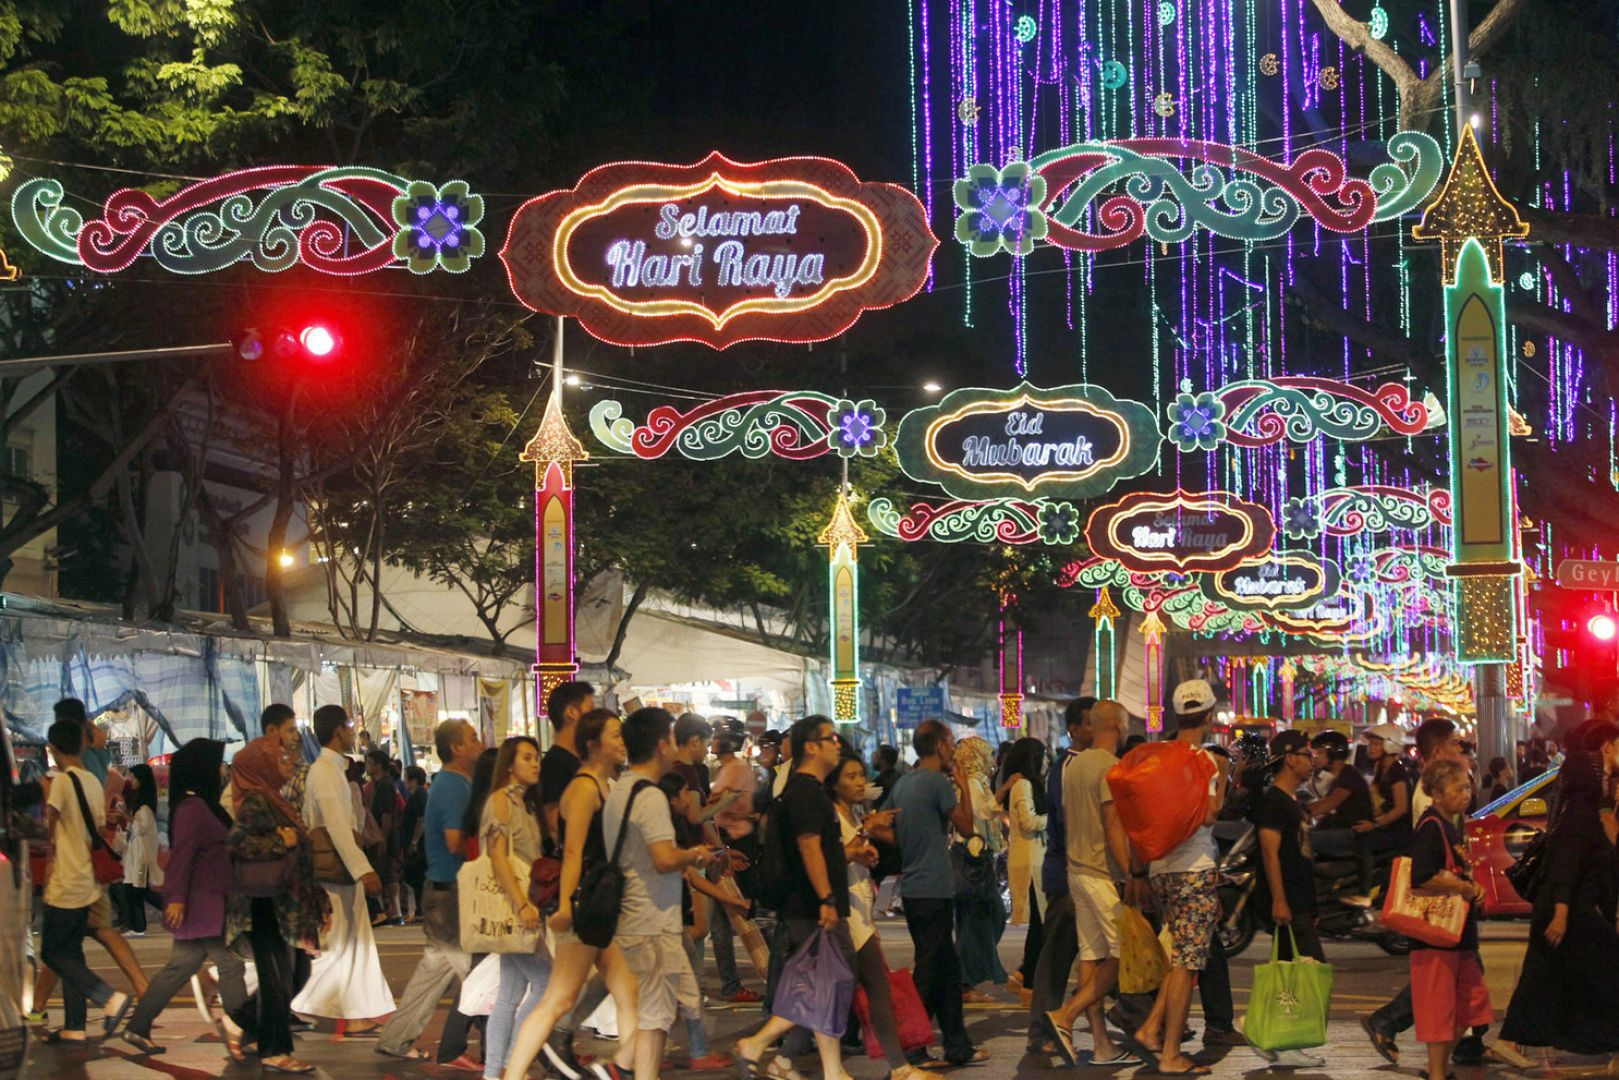 Makan-places-ramadan-venuerific-blog-bazaar-geylang